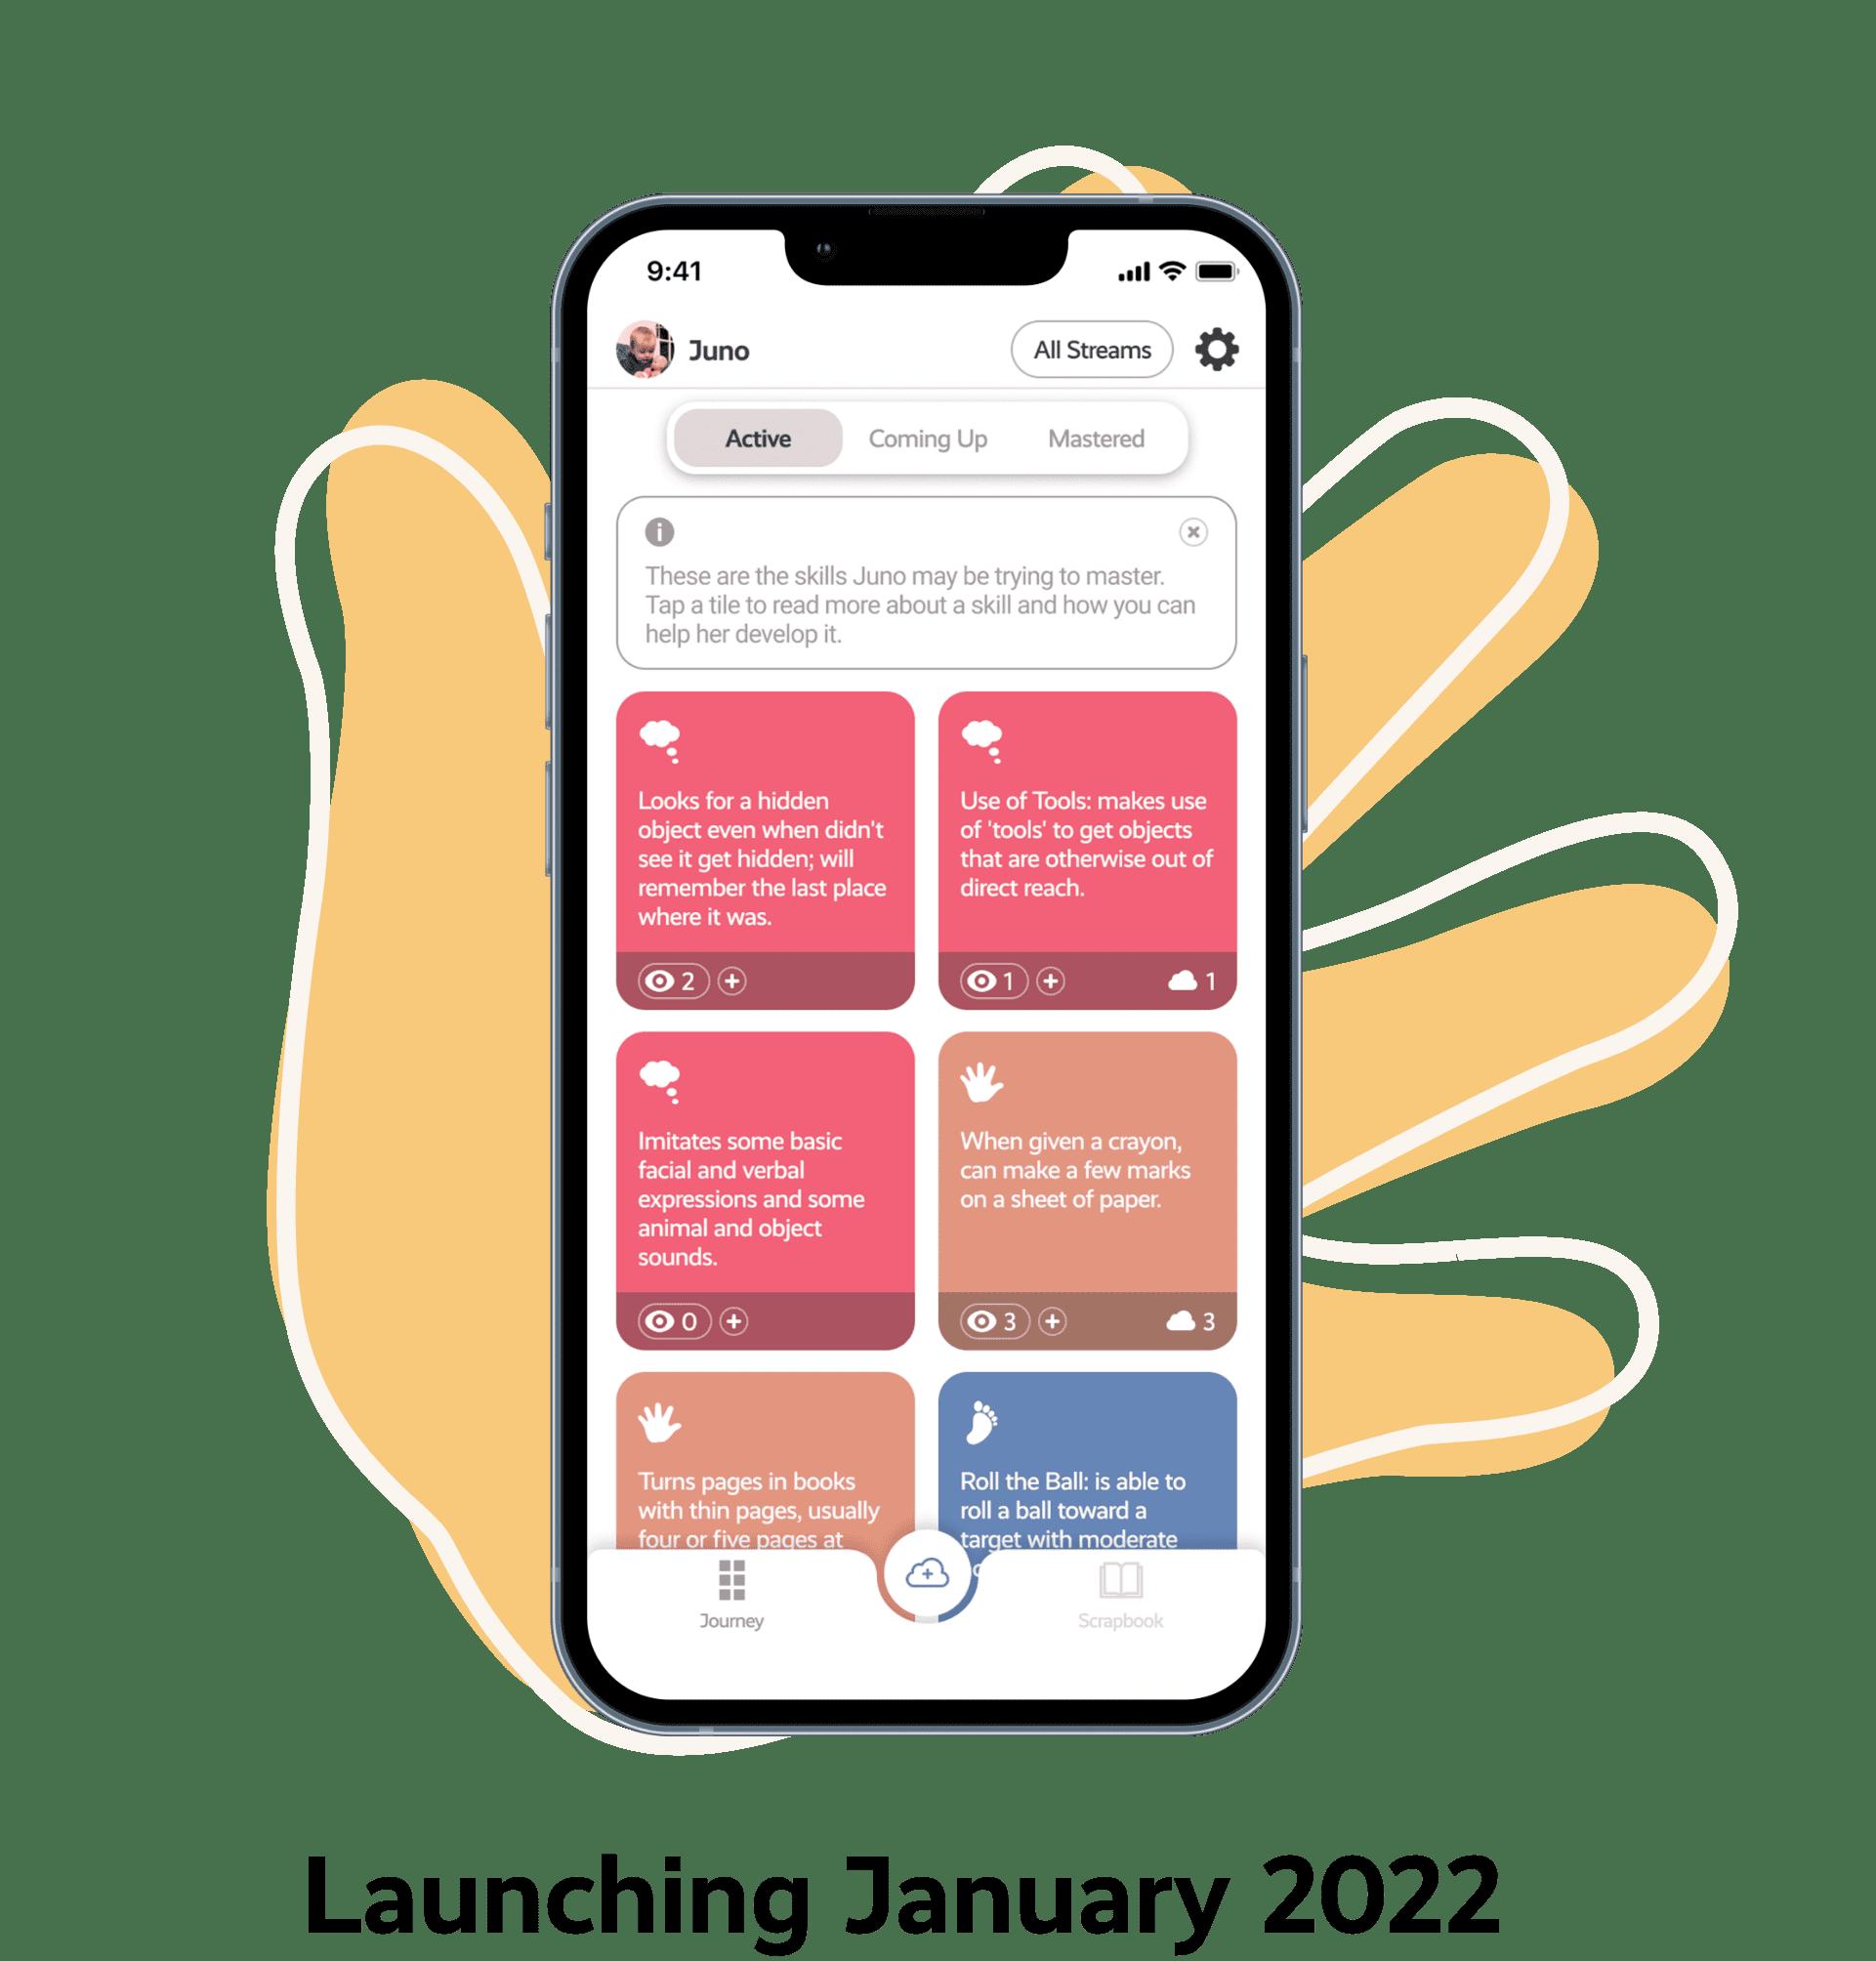 LAUNCHING JANUARY 2022@2x